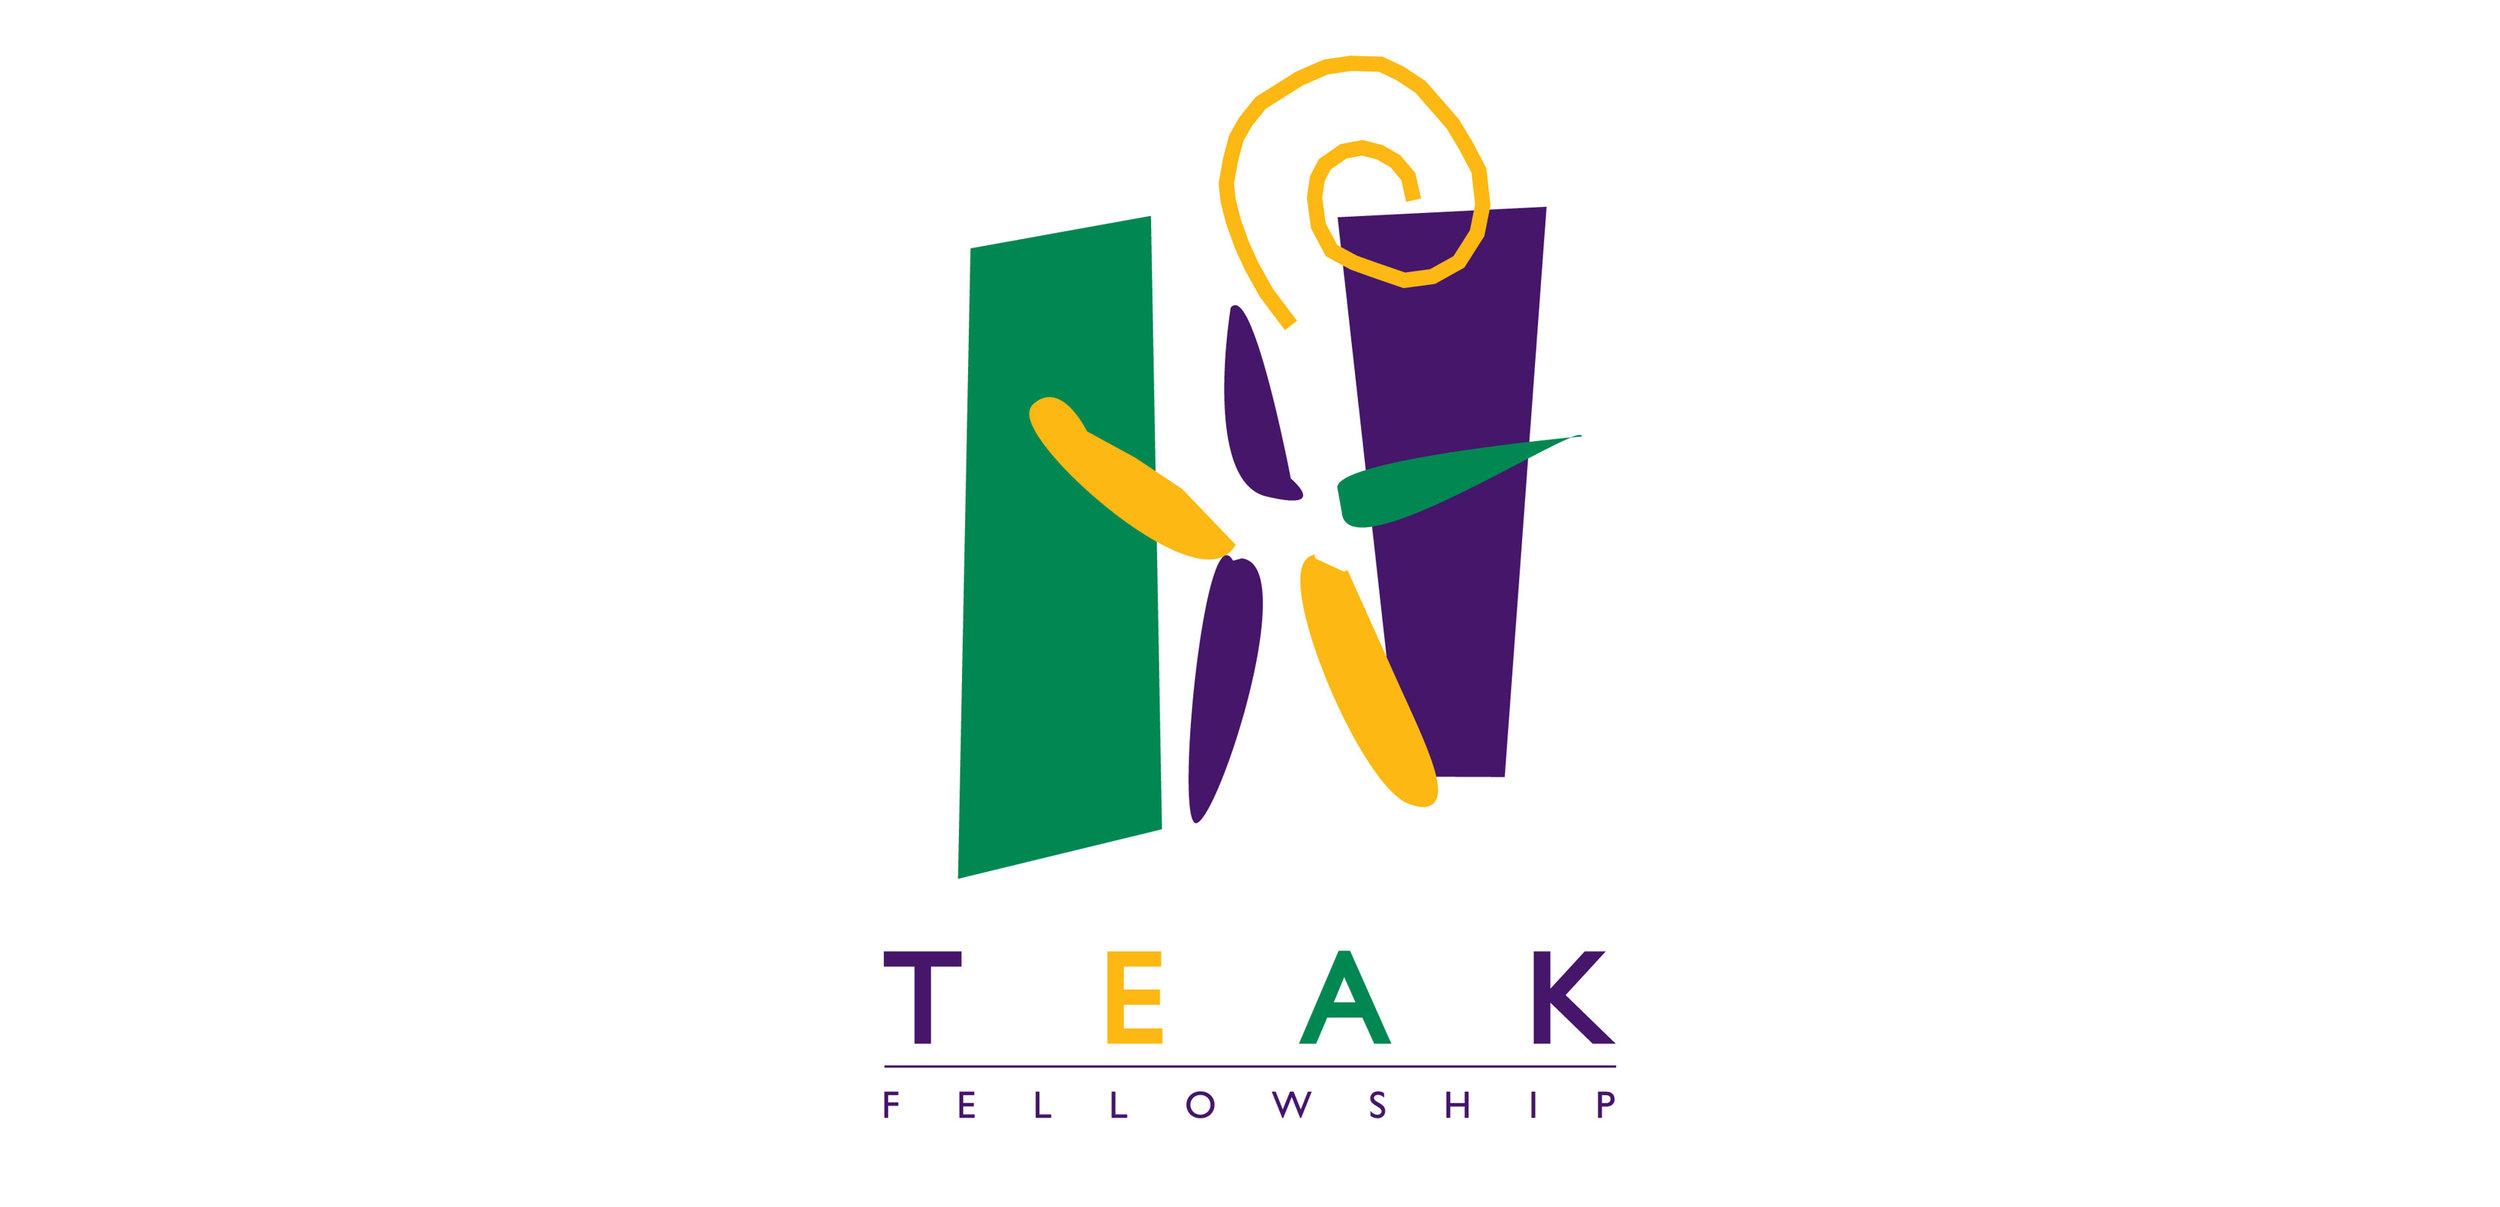 TEAK Fellowship